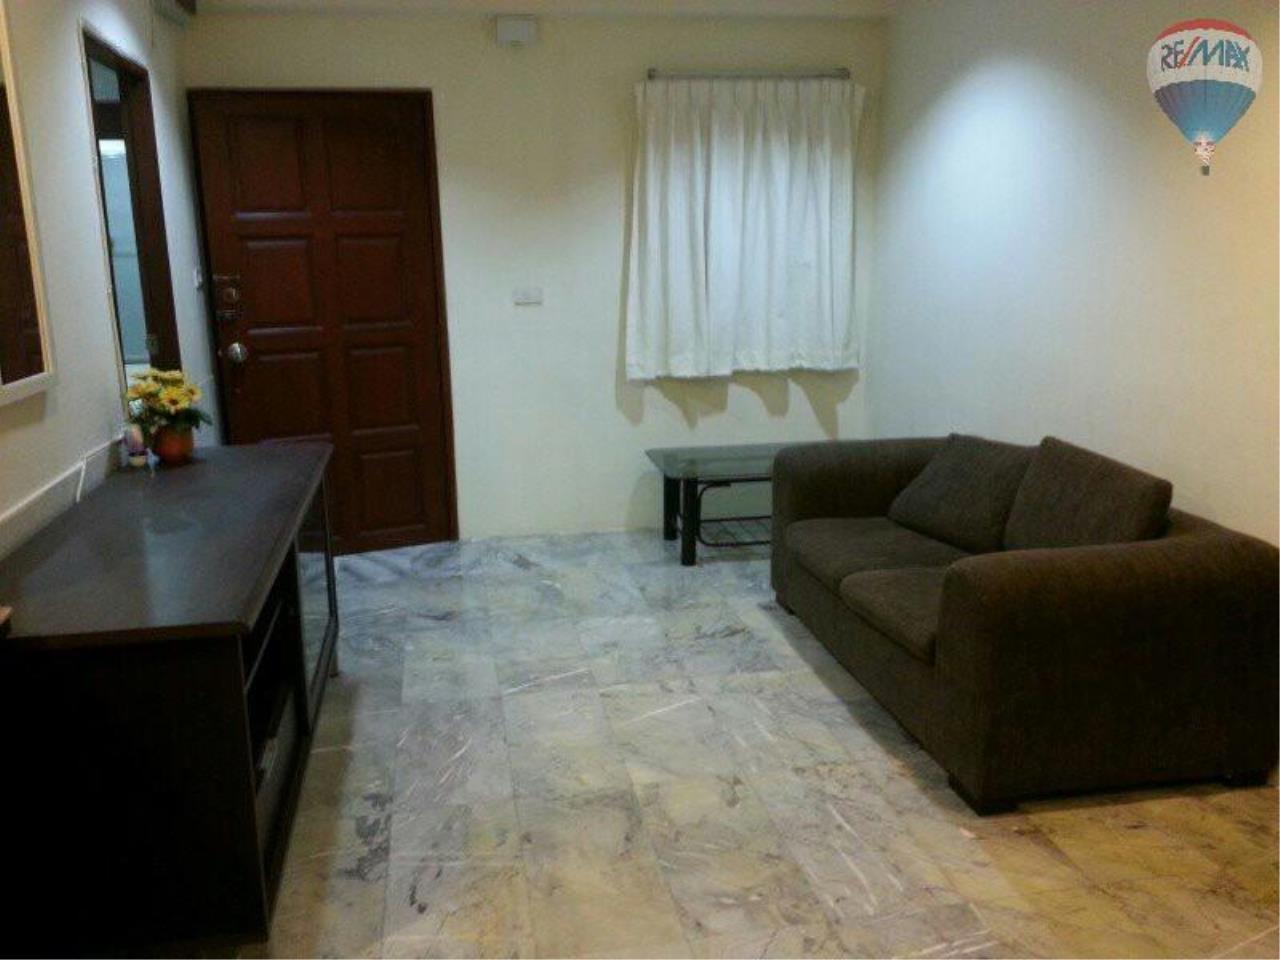 RE/MAX Properties Agency's 1 Bedroom 56 Sq.m for SALE at Saranjai Mansion,Sukhumvit Soi 4 (Nana) 1